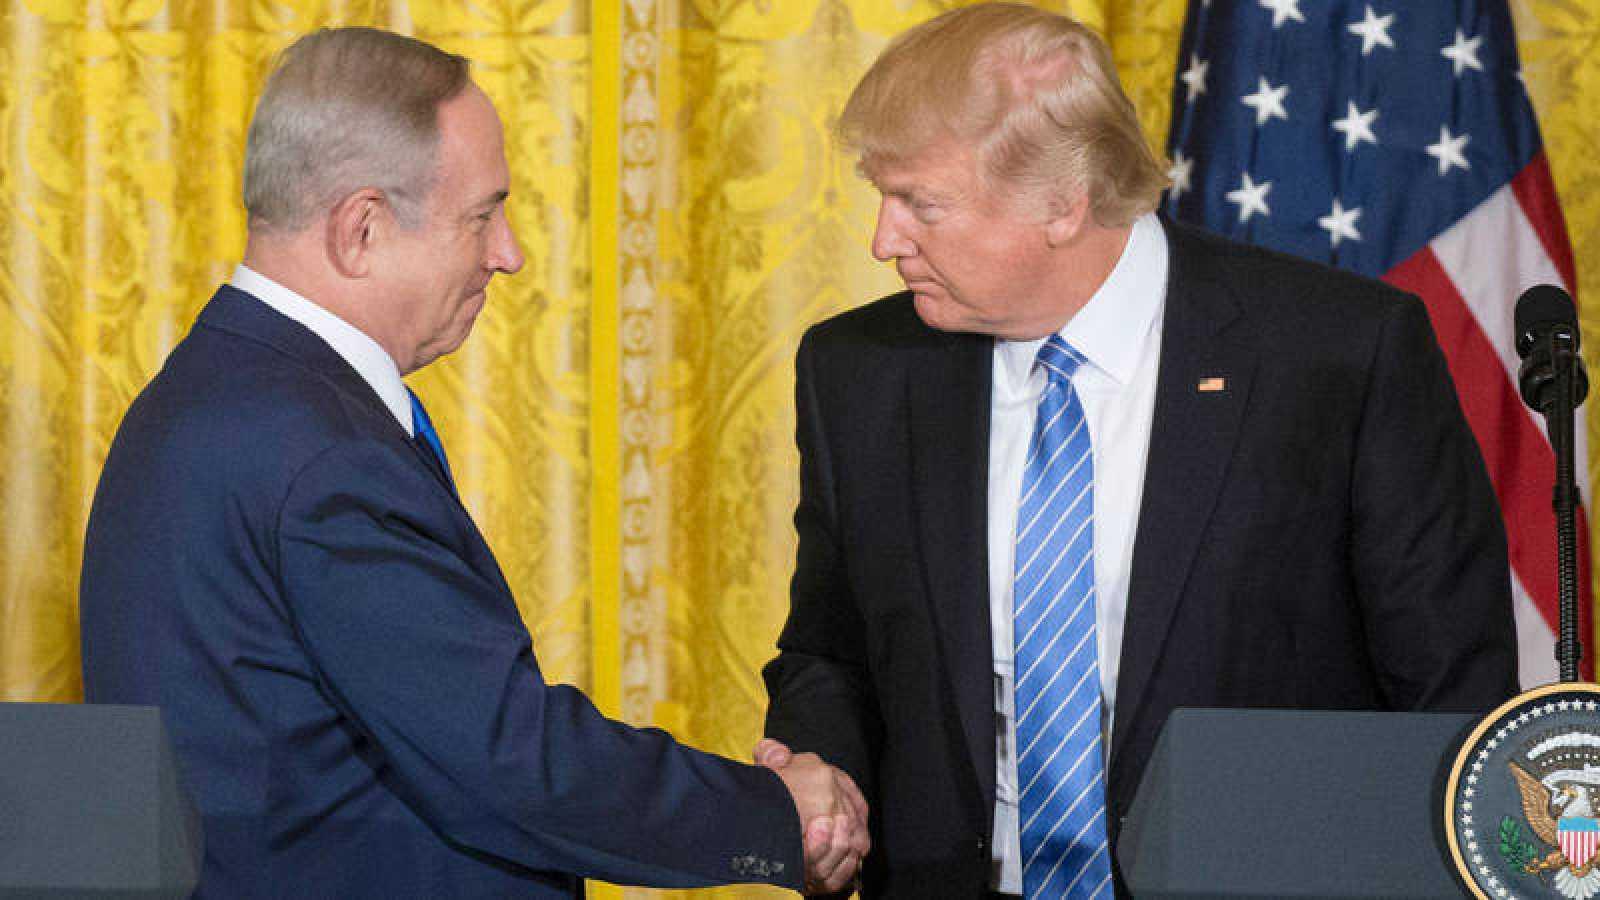 Donald Trump estrecha la mano del primer ministro israelí Benjamin Netanyahu en febrero de 2017